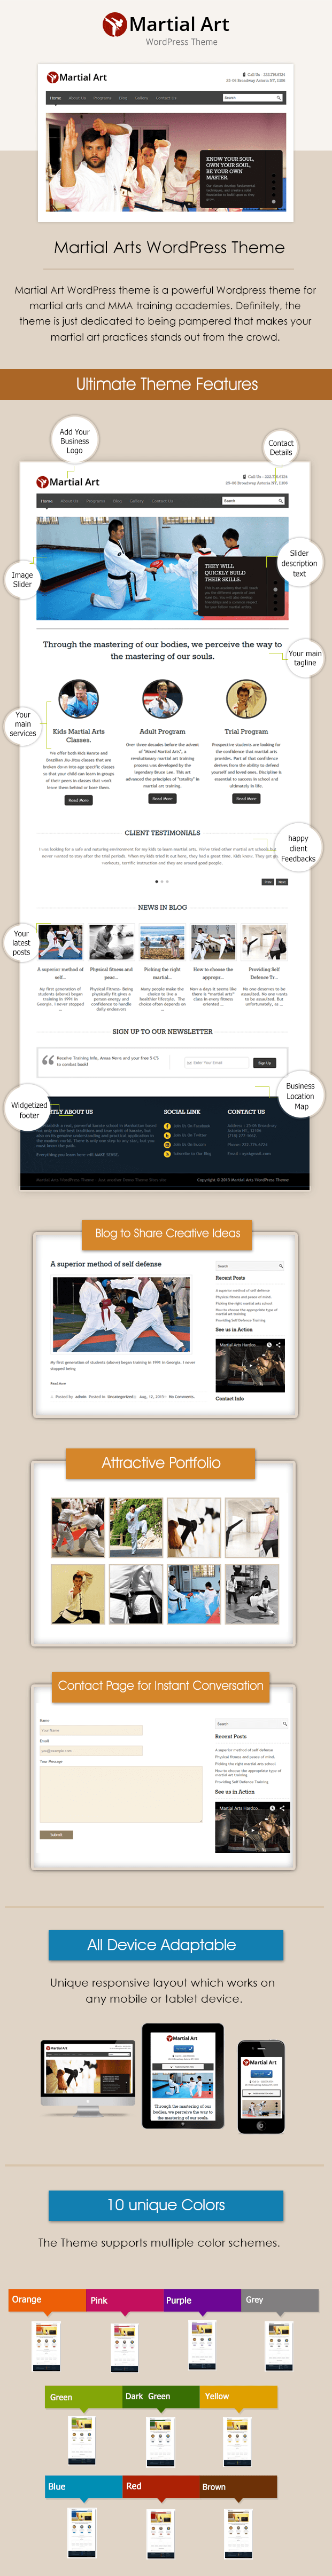 WordPress Theme for Martial Art